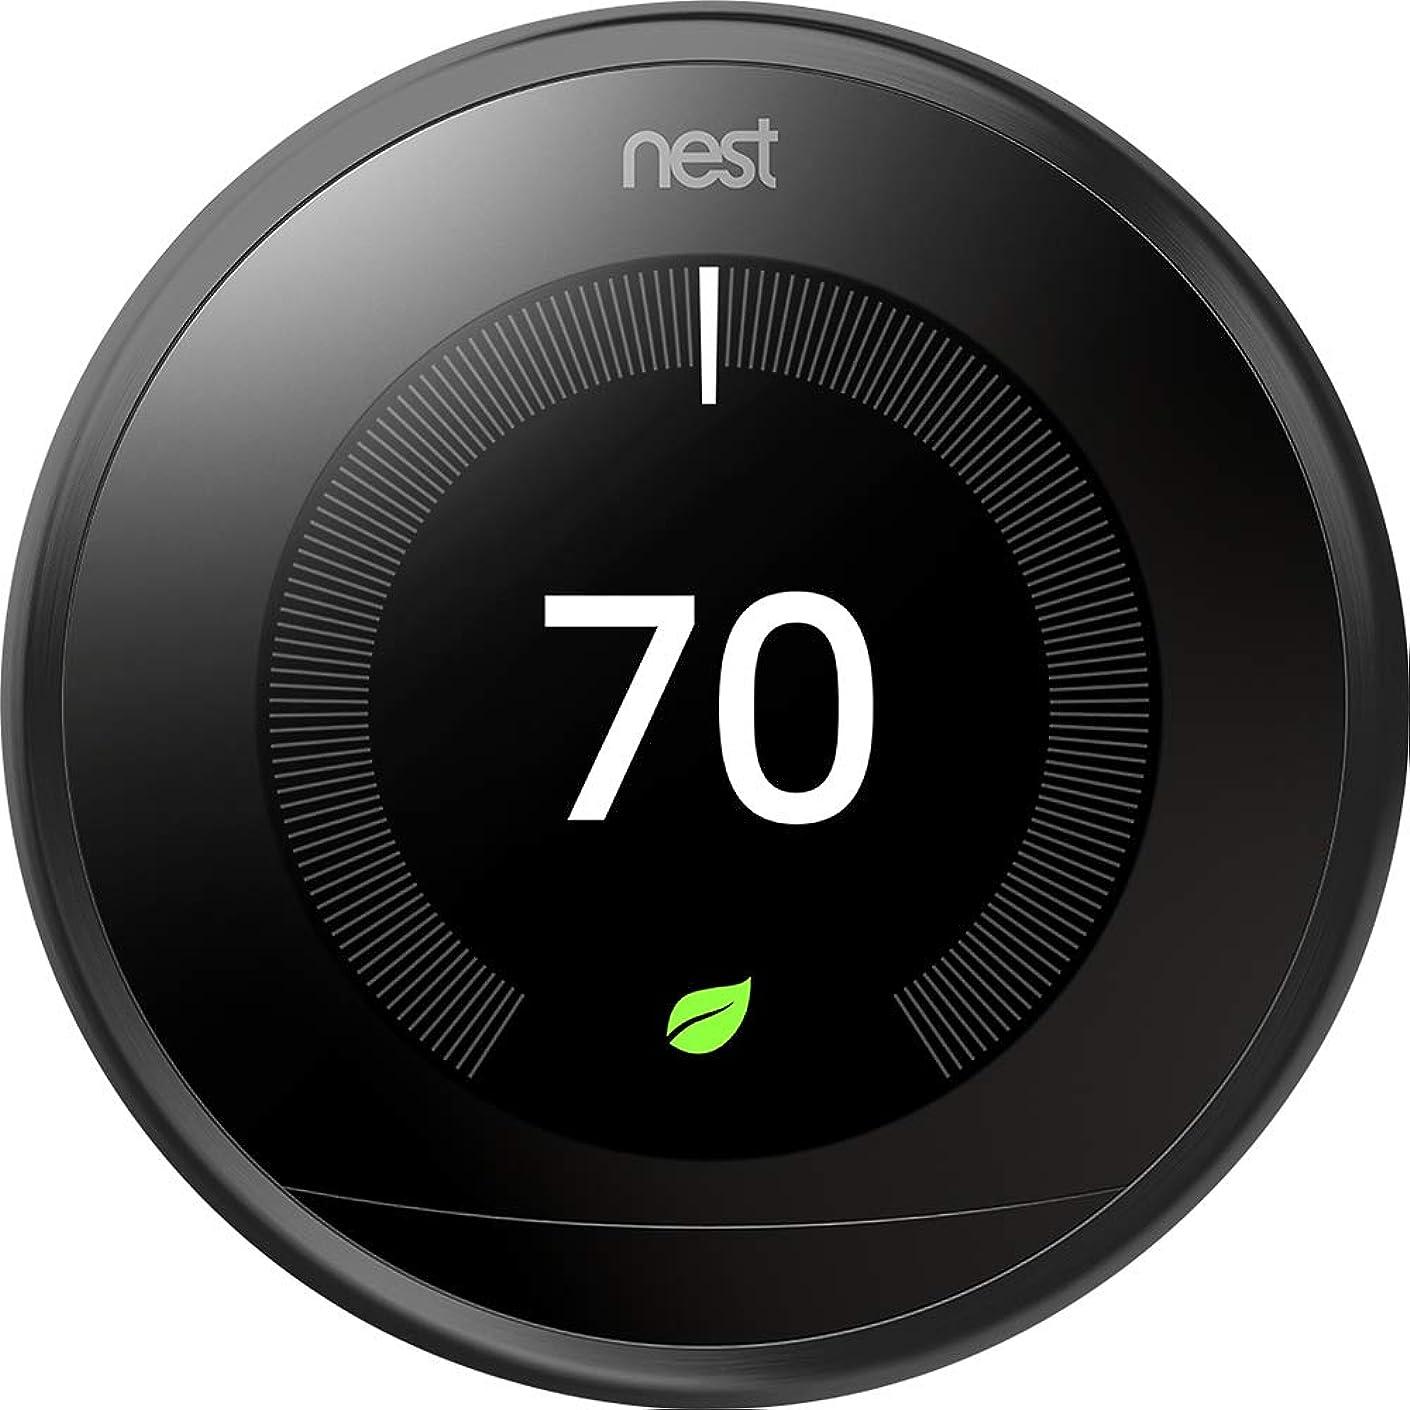 Nest 9750016 T3016US Thermostat 3.3 x 1.2 x 3.3 Black